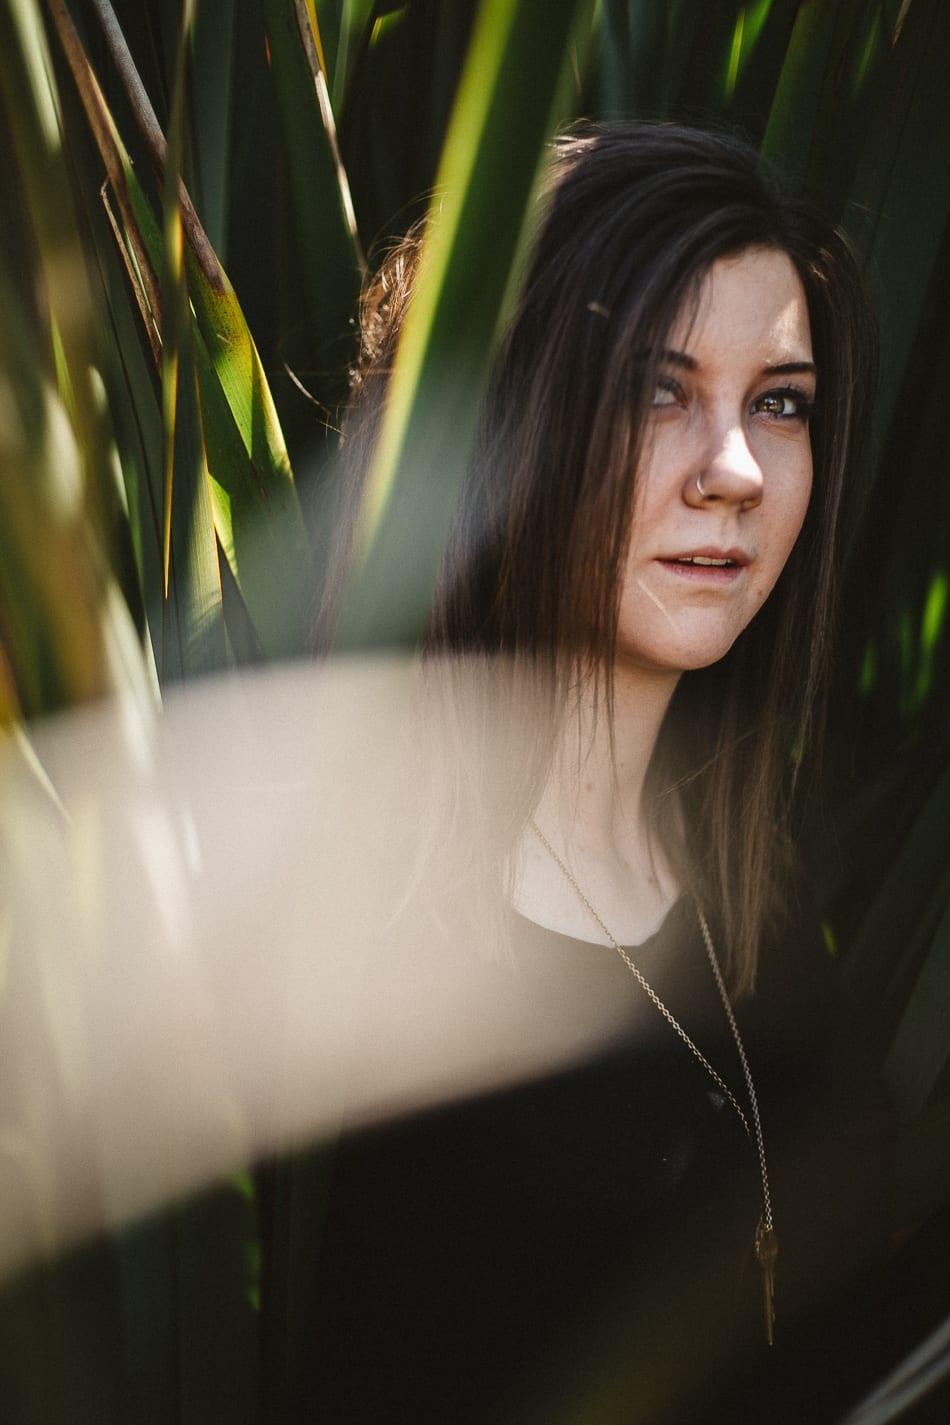 napa-california-lifestyle-portrait-photographer-6